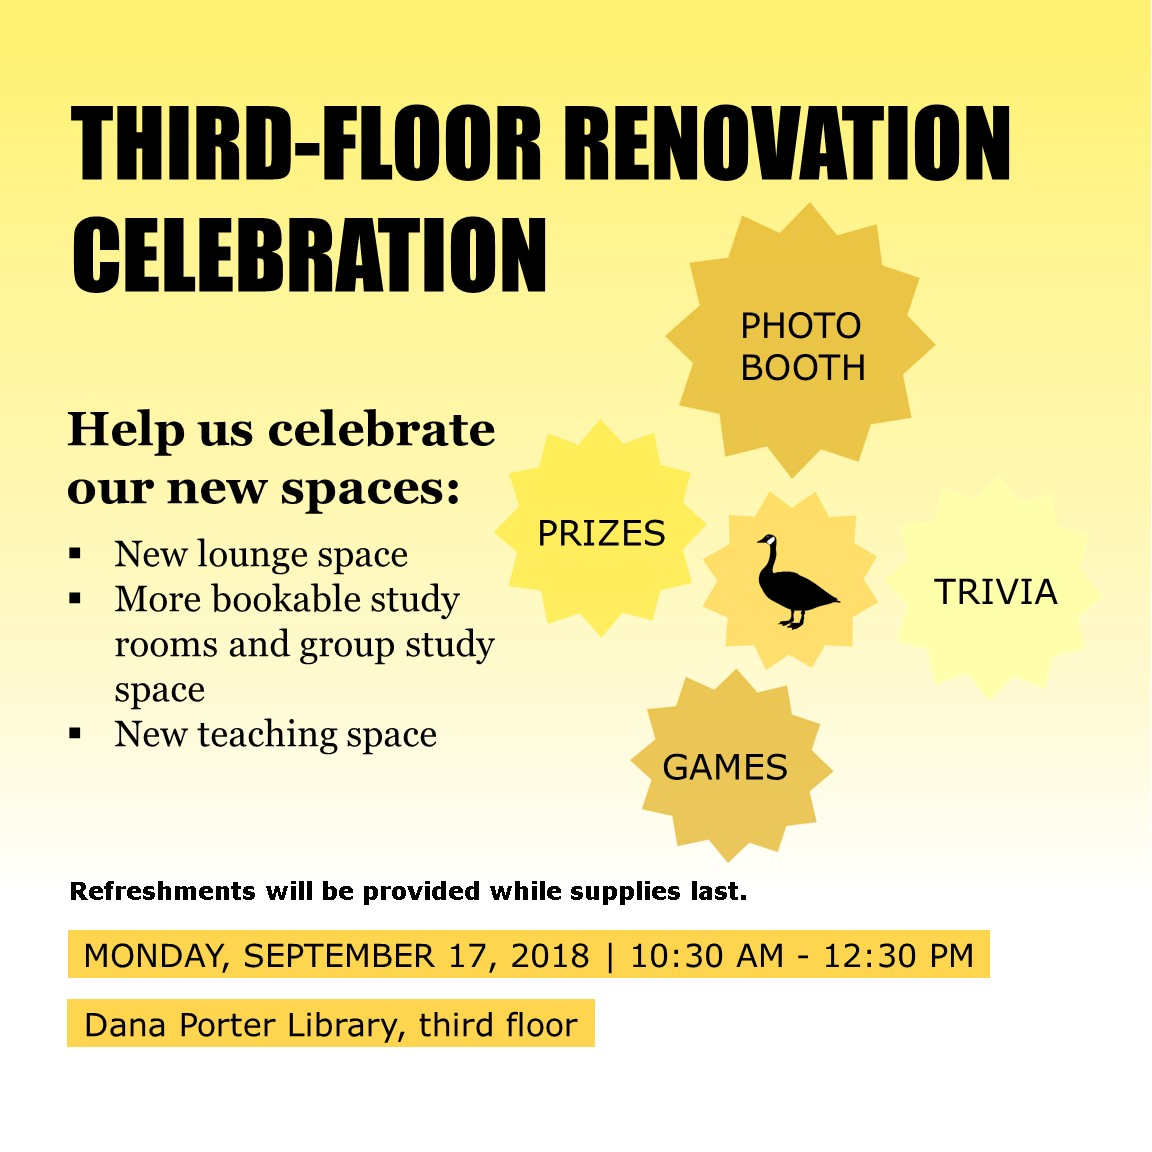 Third-floor renovation celebration